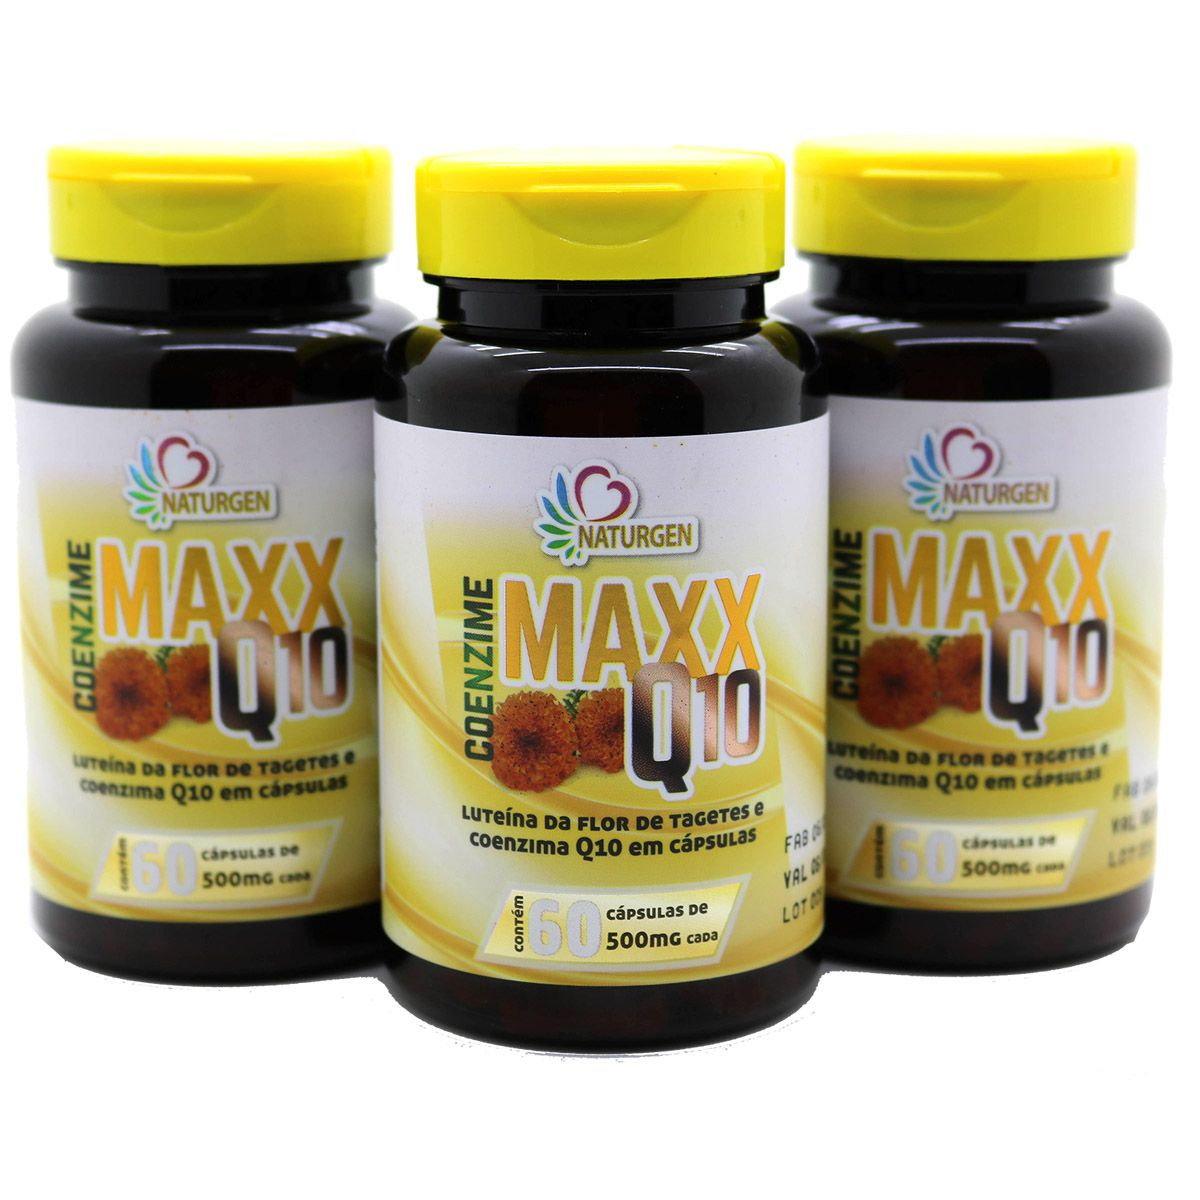 3 Coenzima Q10 Maxx Luteina Zeaxantina 60 Capsulas